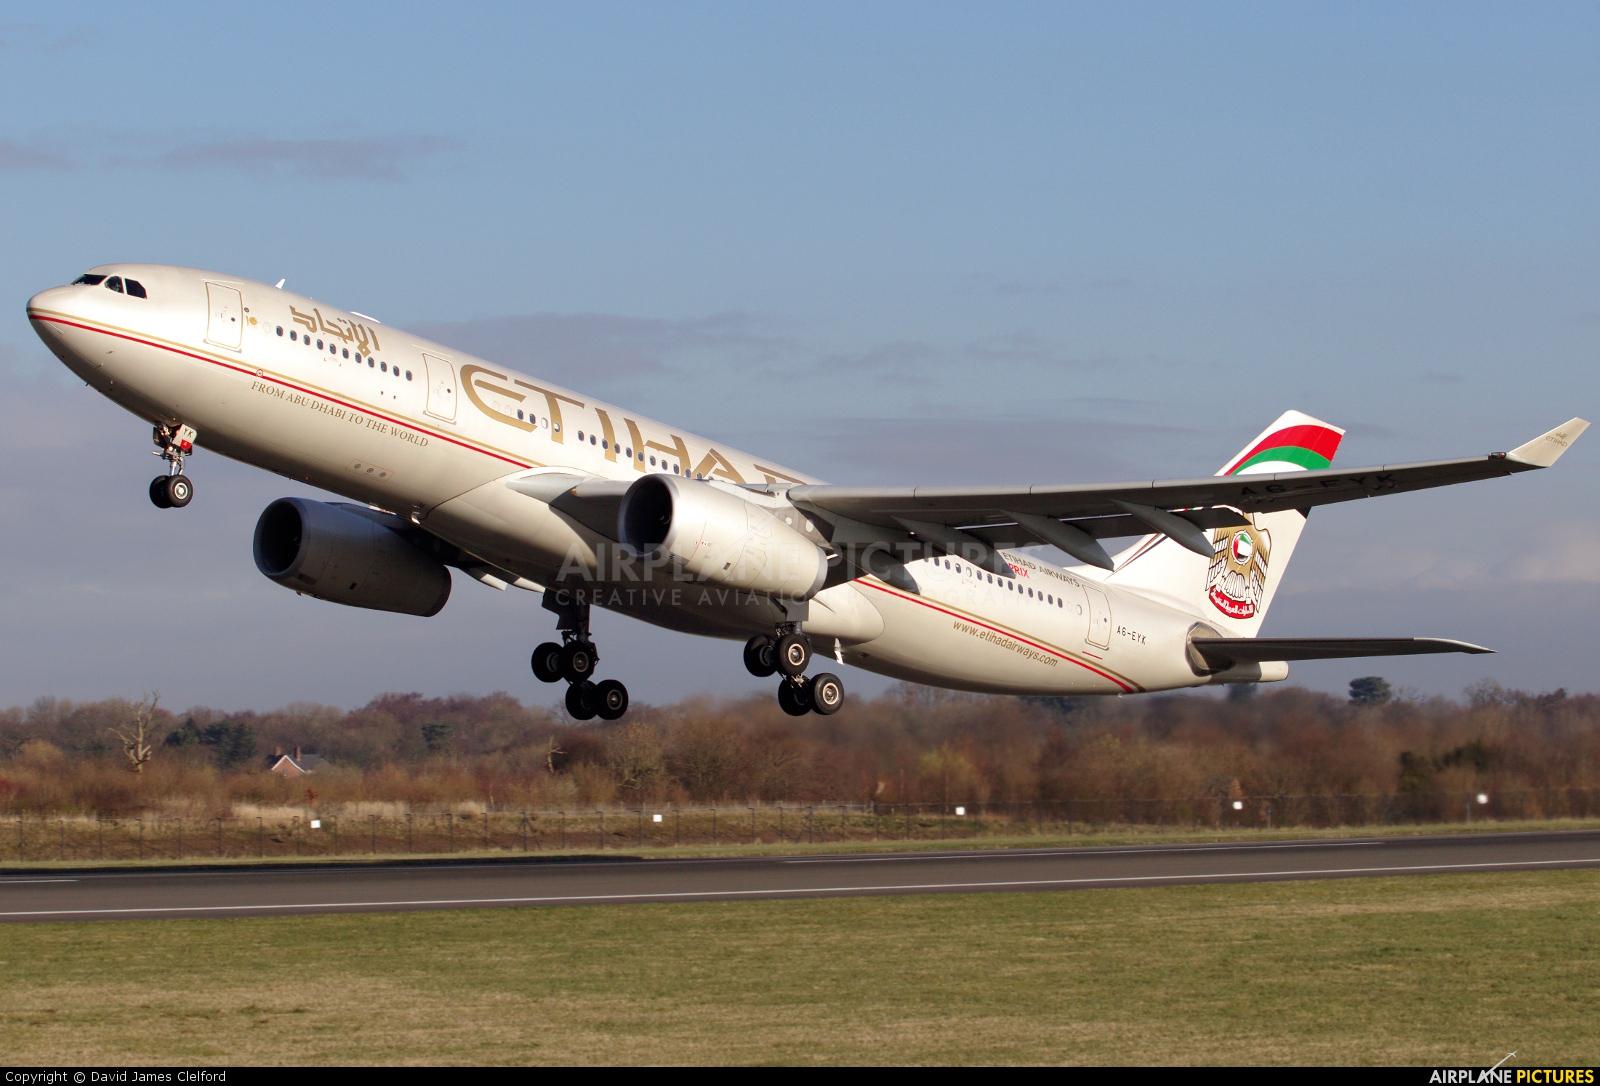 Etihad Airways A6-EYK aircraft at Manchester